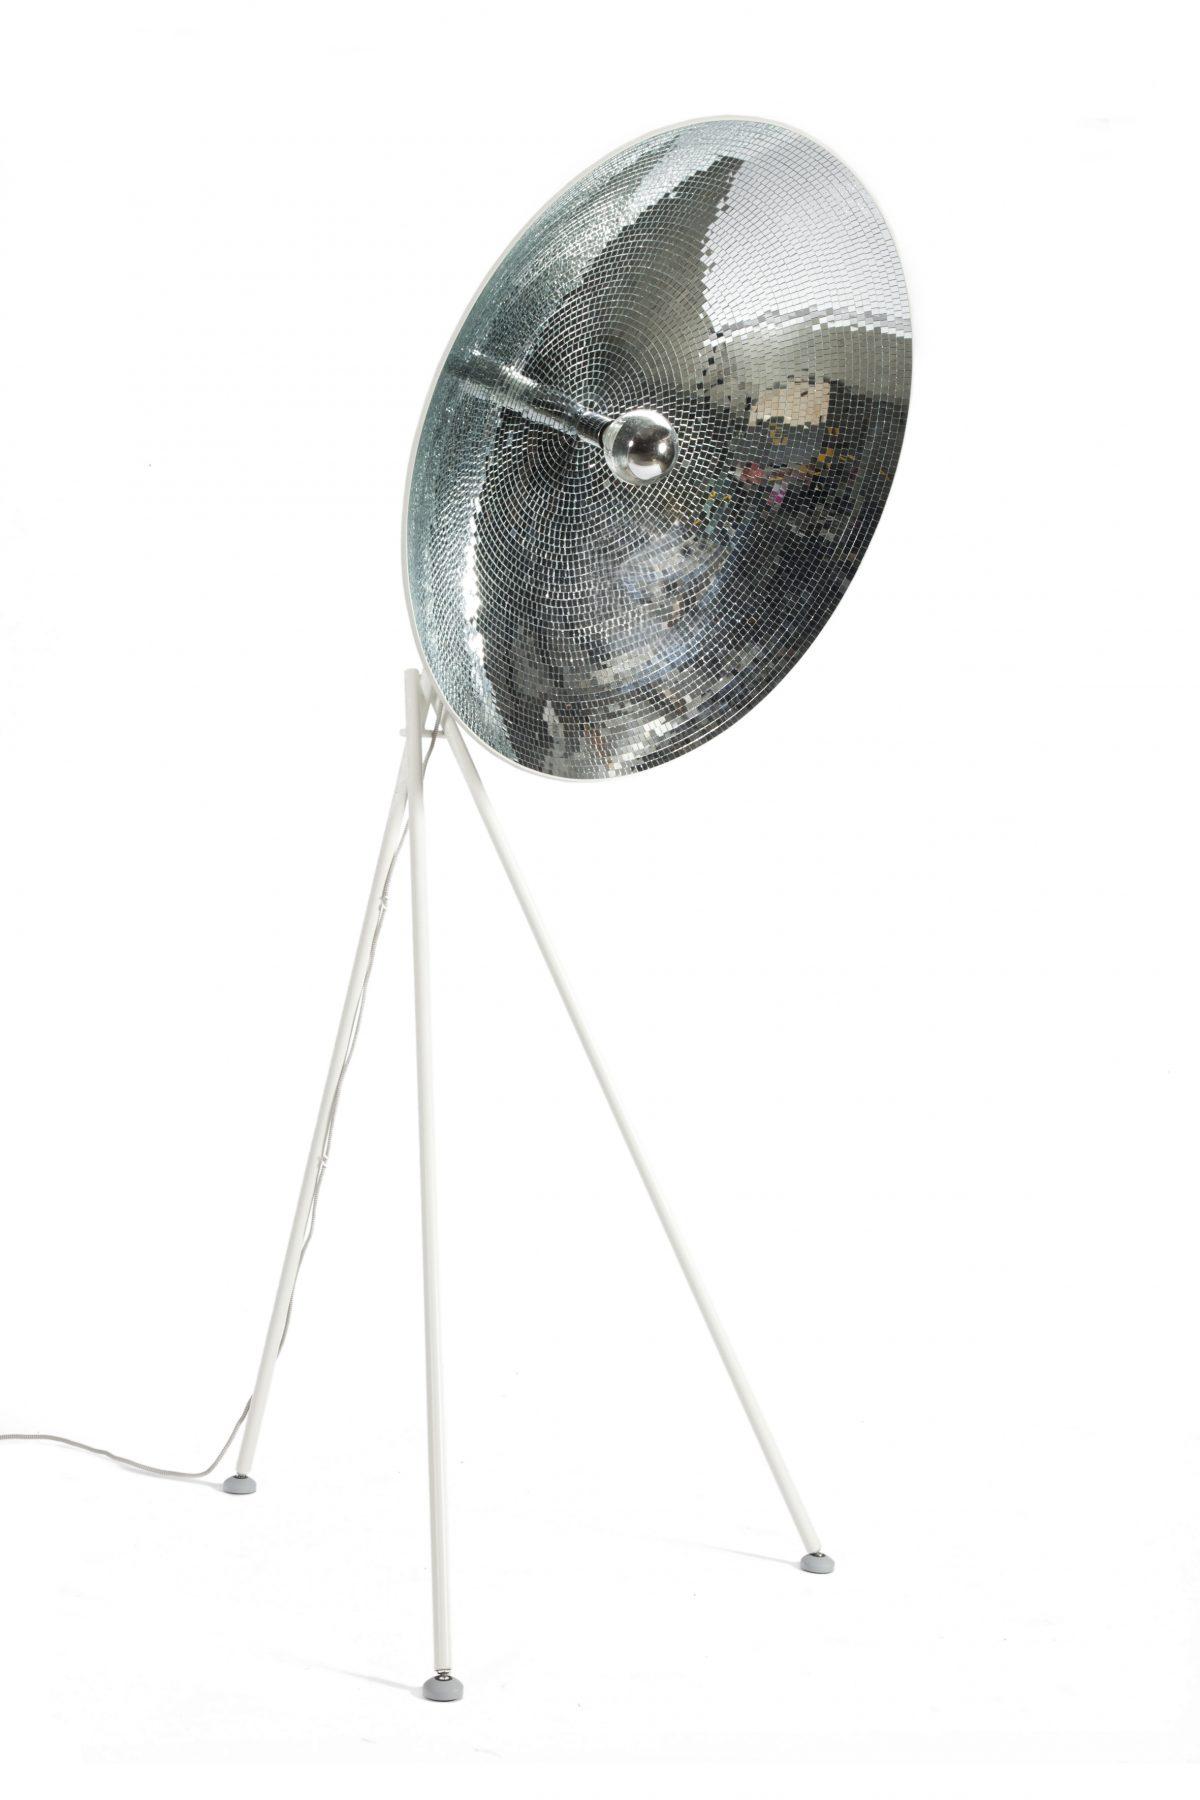 Disco dish vloerlamp dhph Bertjan Pot – Gimmii